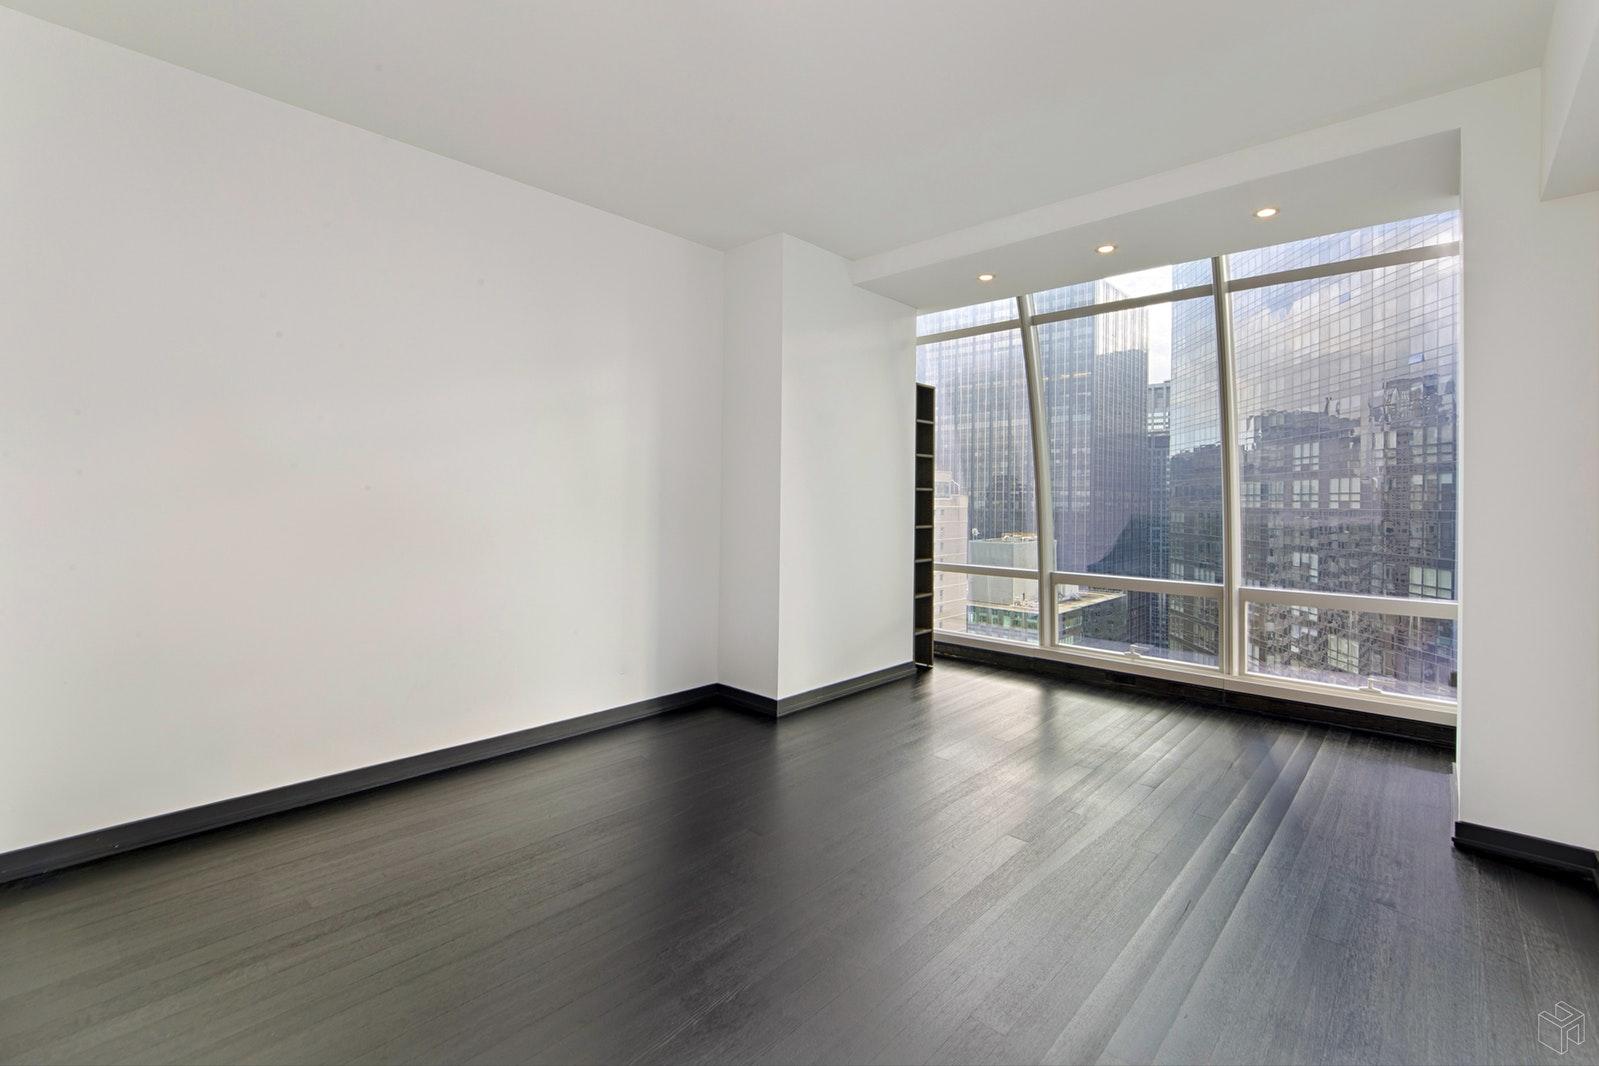 157 WEST 57TH STREET 39E, Midtown West, $12,850, Web #: 18599834